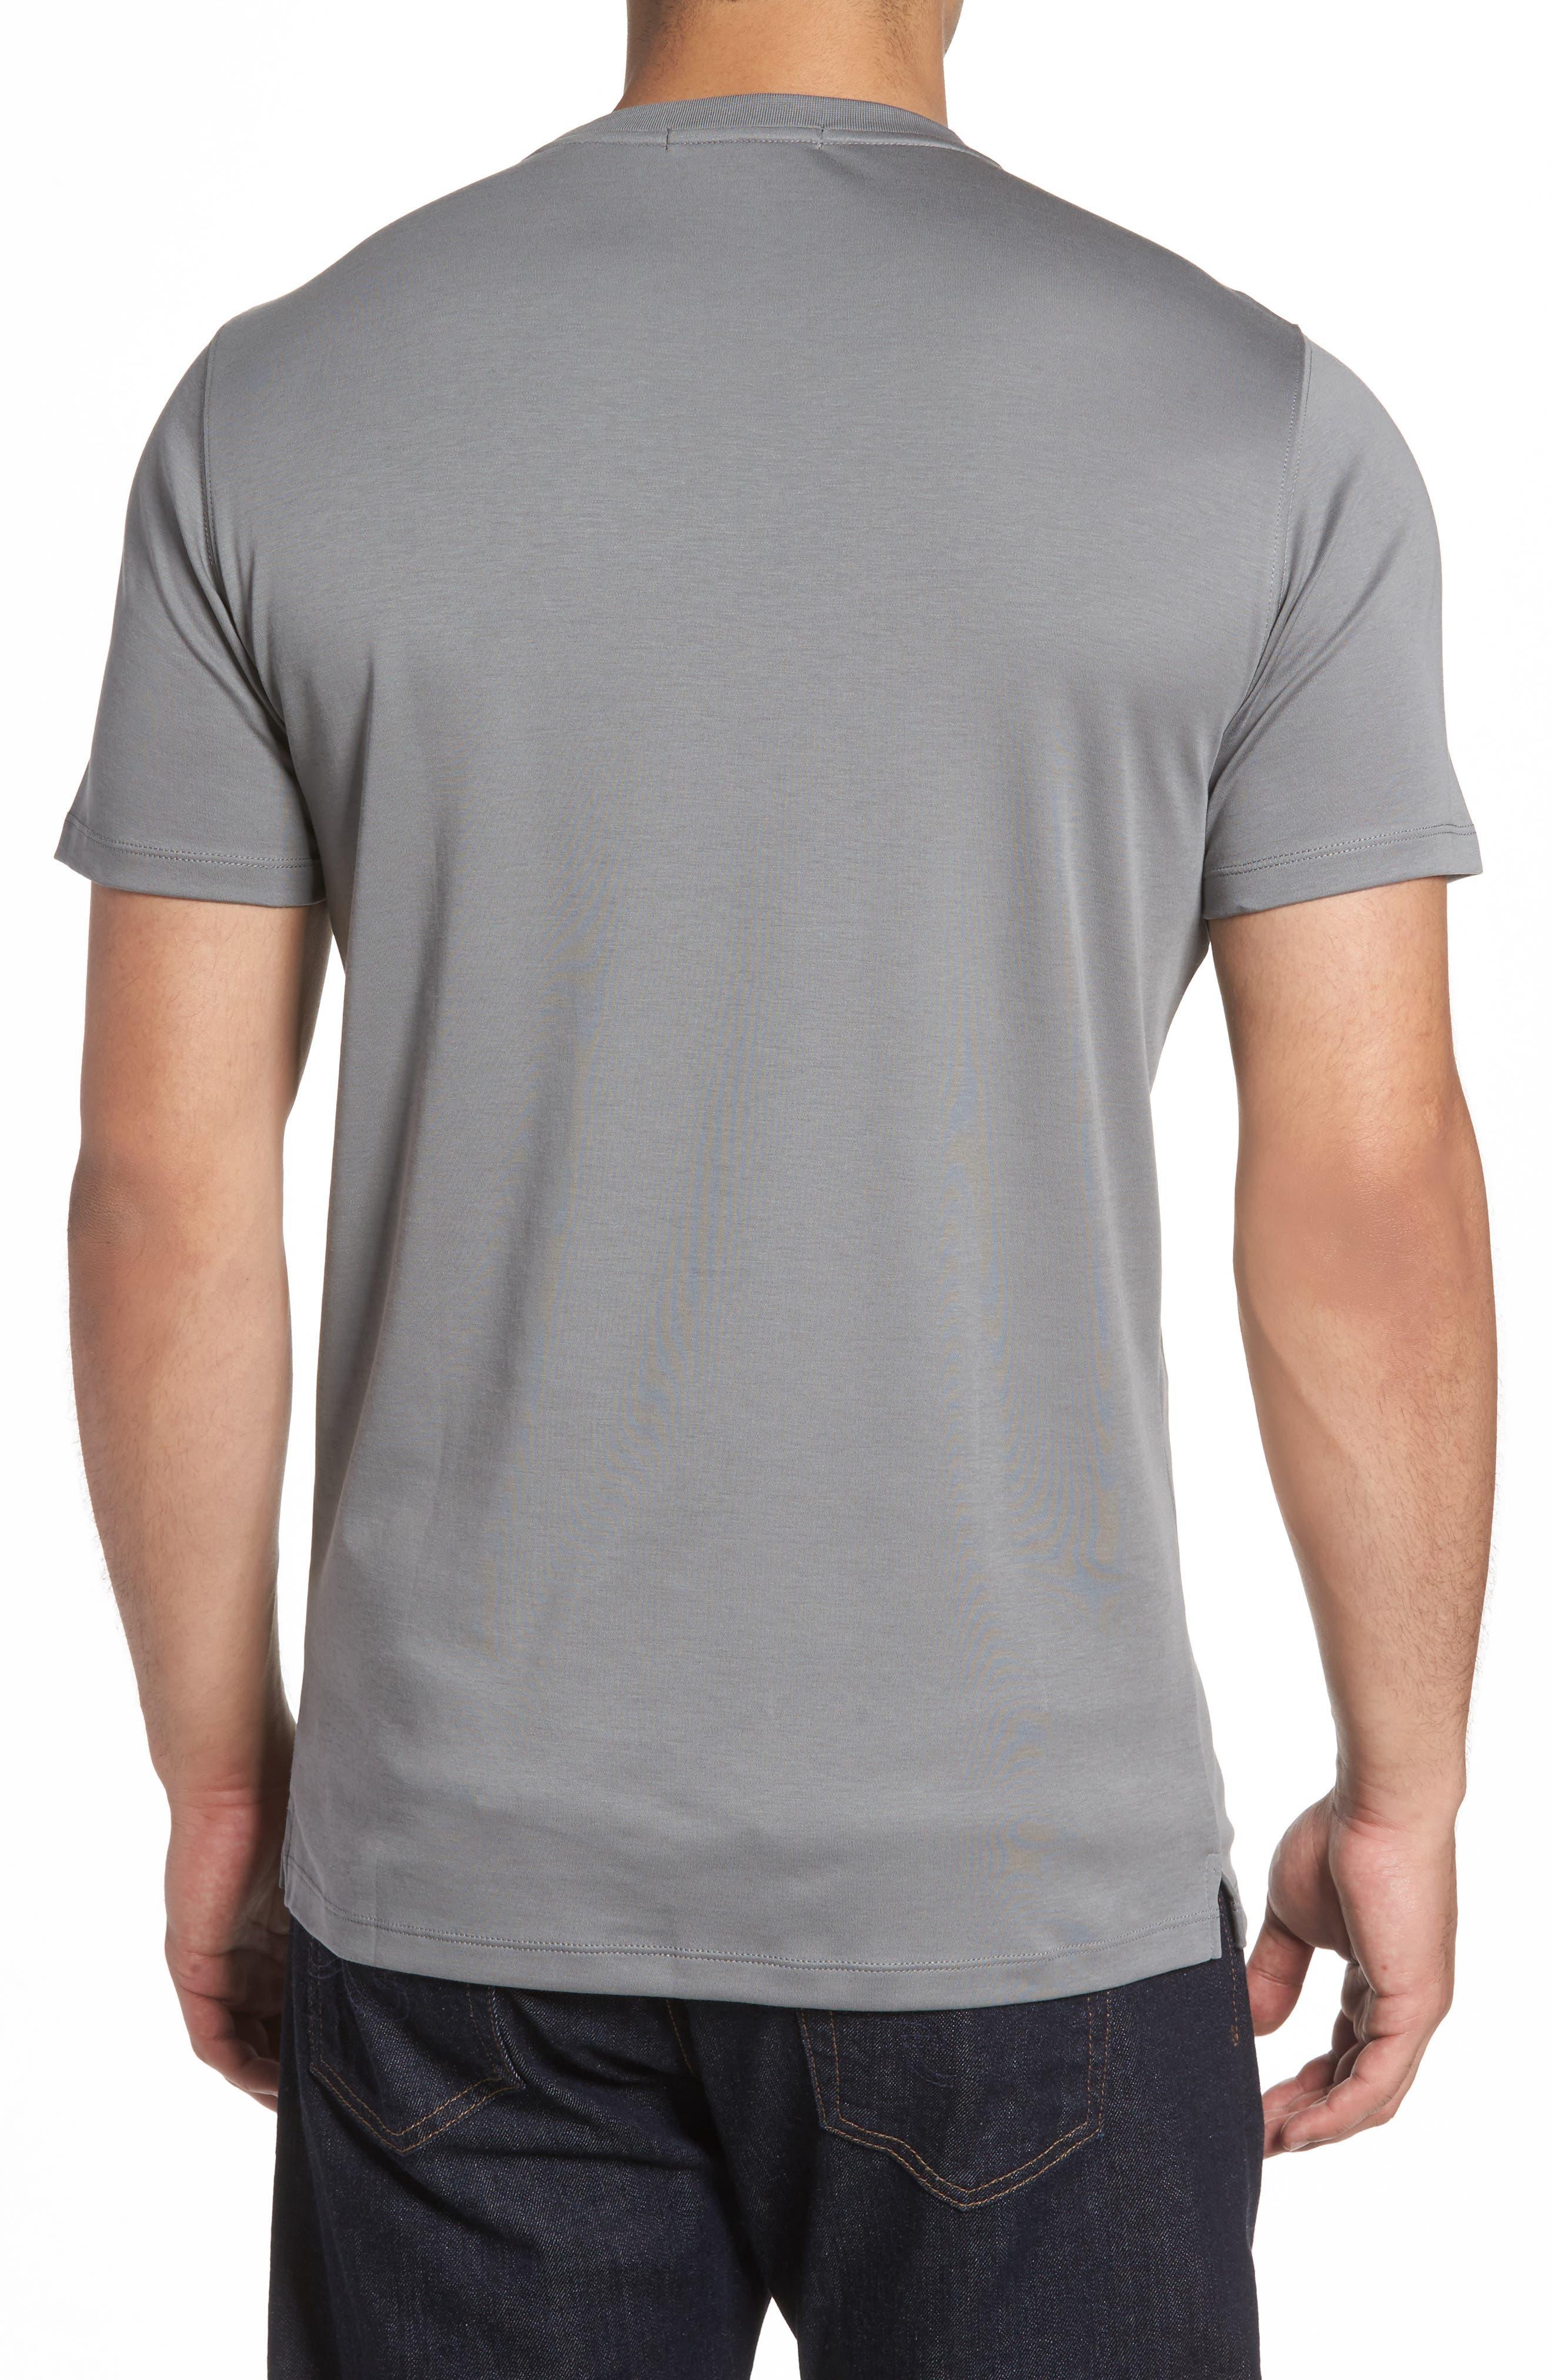 Alternate Image 2  - Robert Barakett 'Georgia' Crewneck T-Shirt